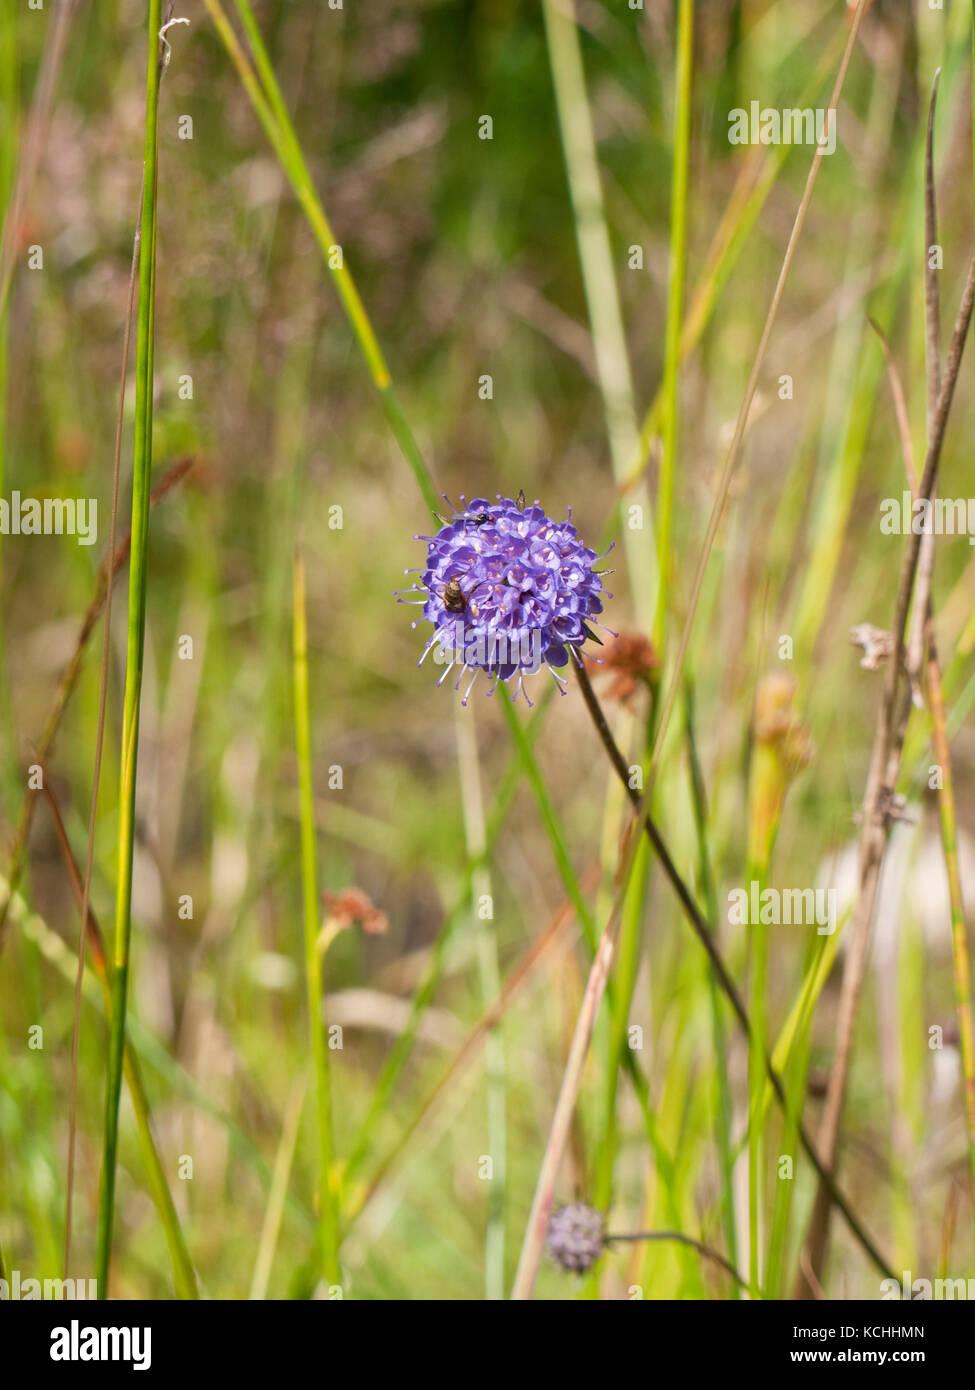 Devil's-bit scabious (Succisa pratensis) flowering on Rannoch Moor, Scottish Highlands - Stock Image